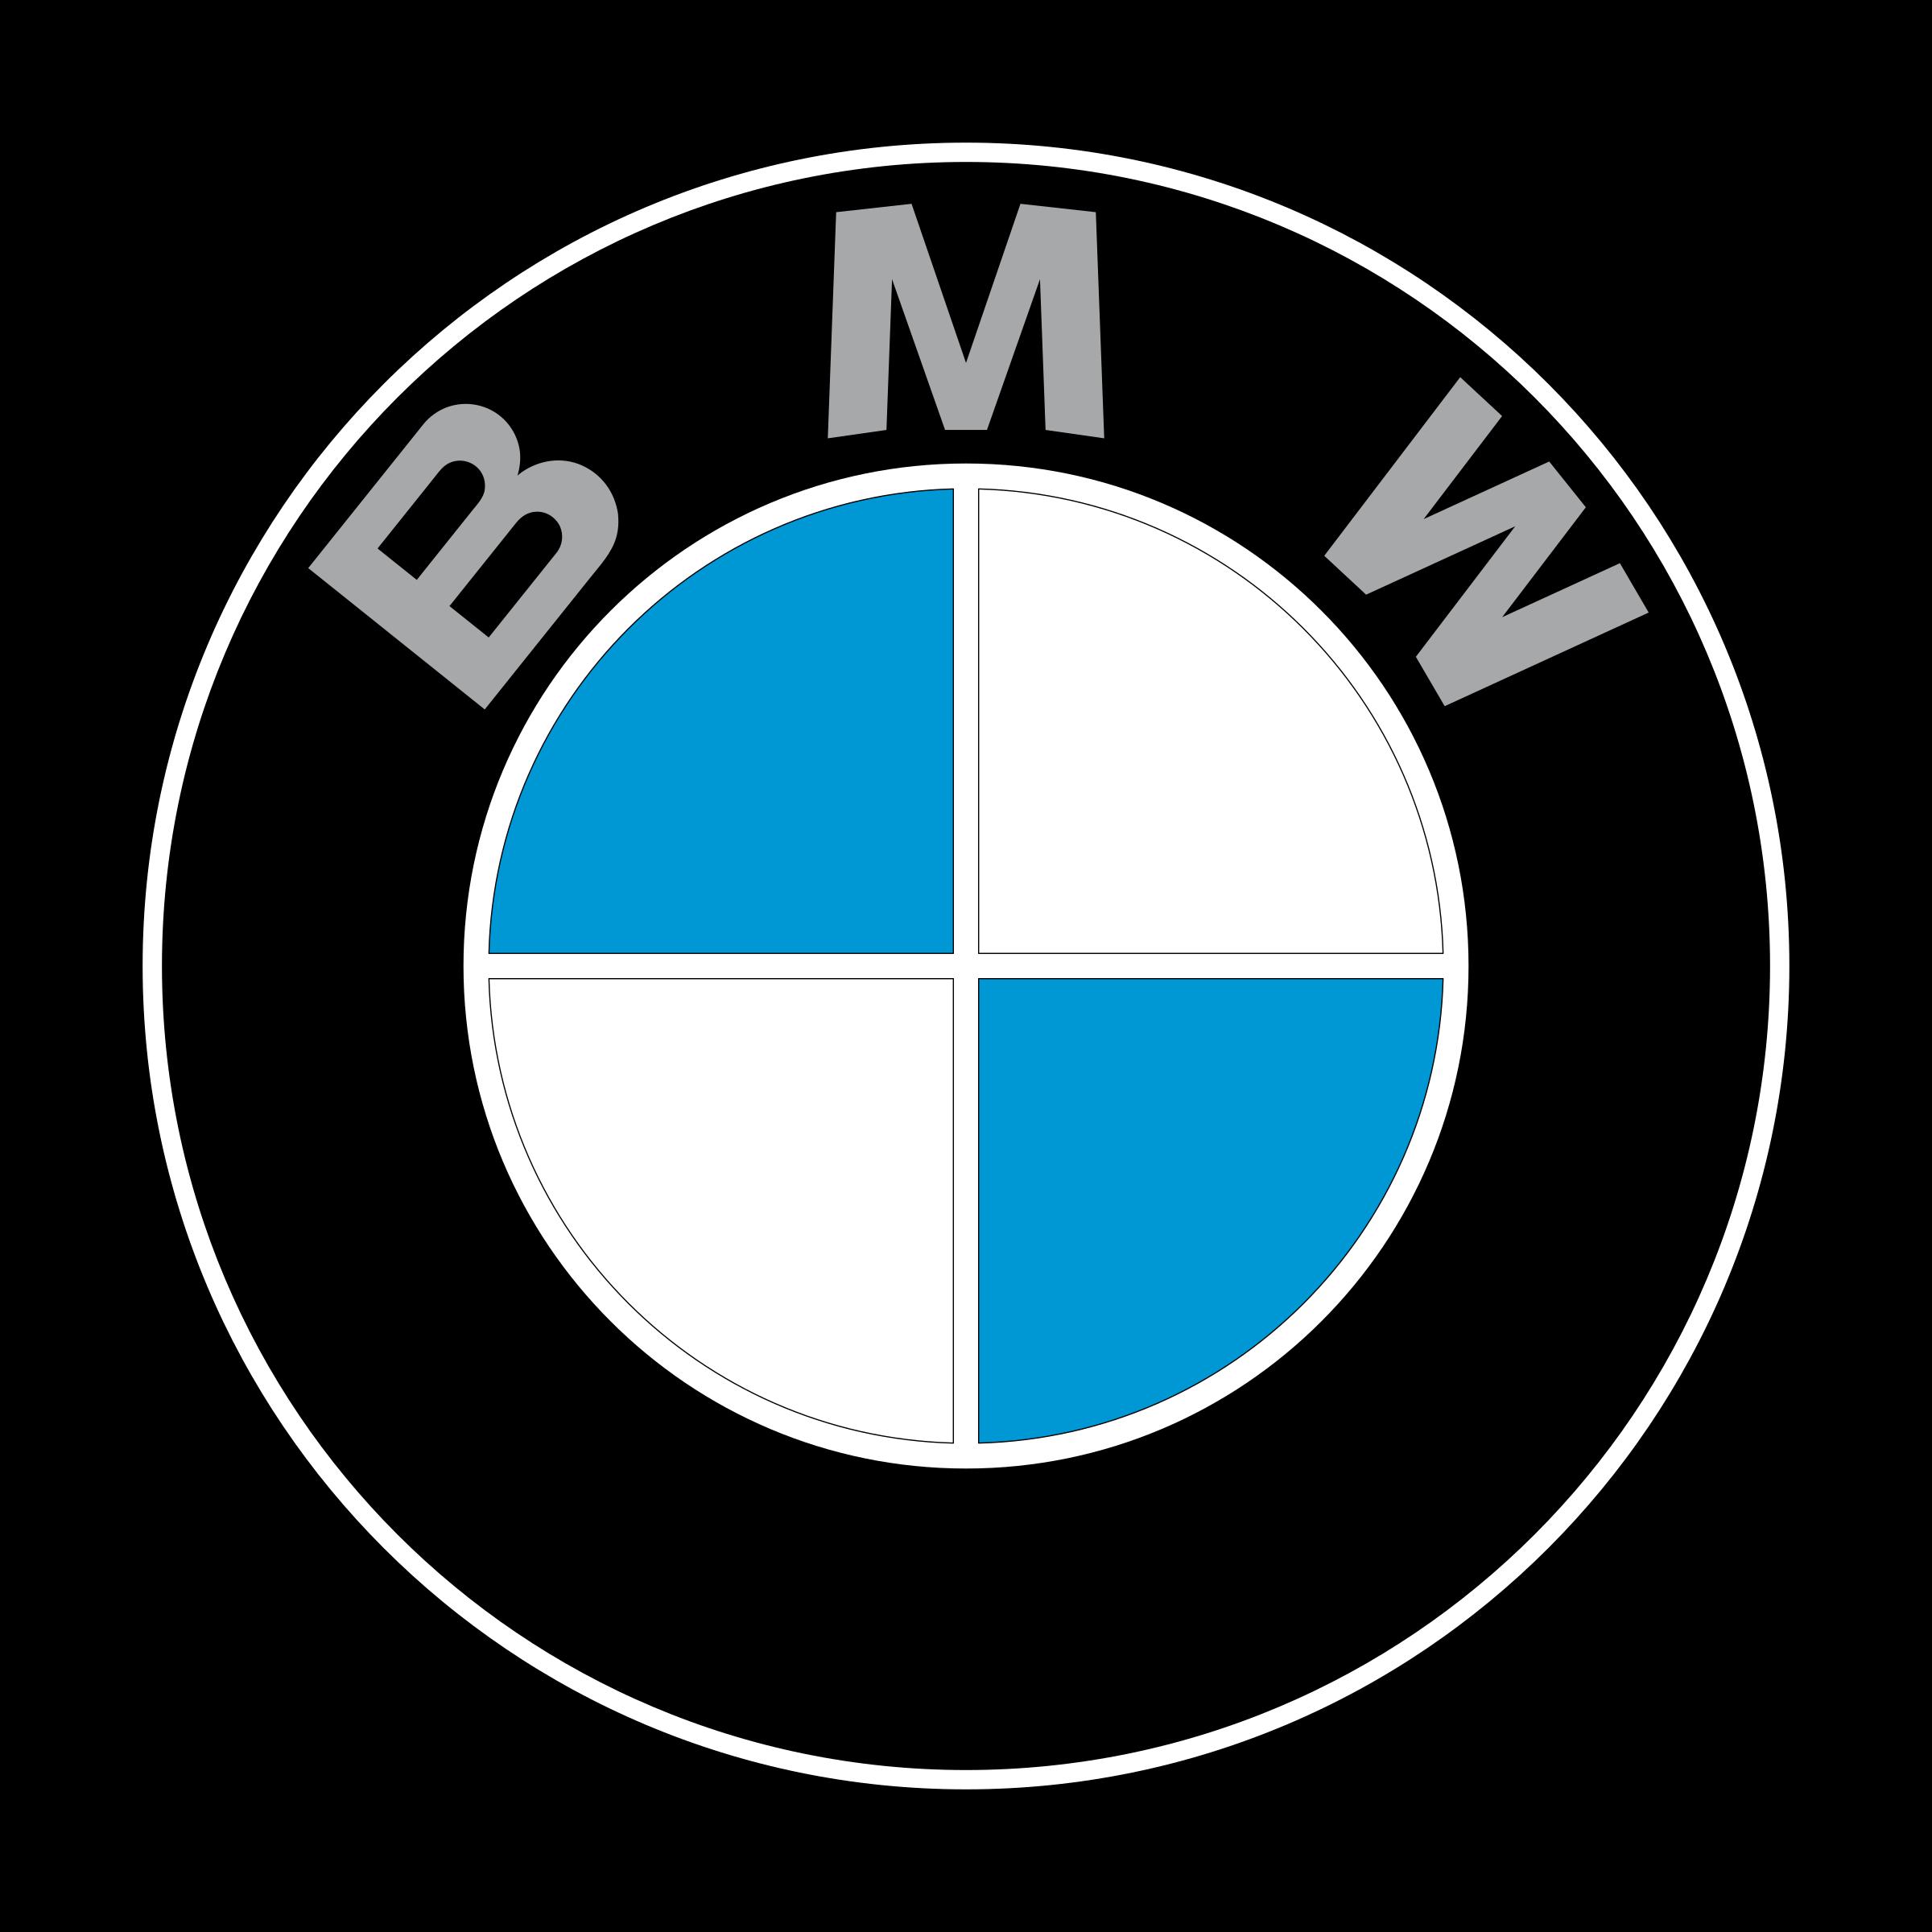 BMW 01 Logo PNG Transparent & SVG Vector - Freebie Supply